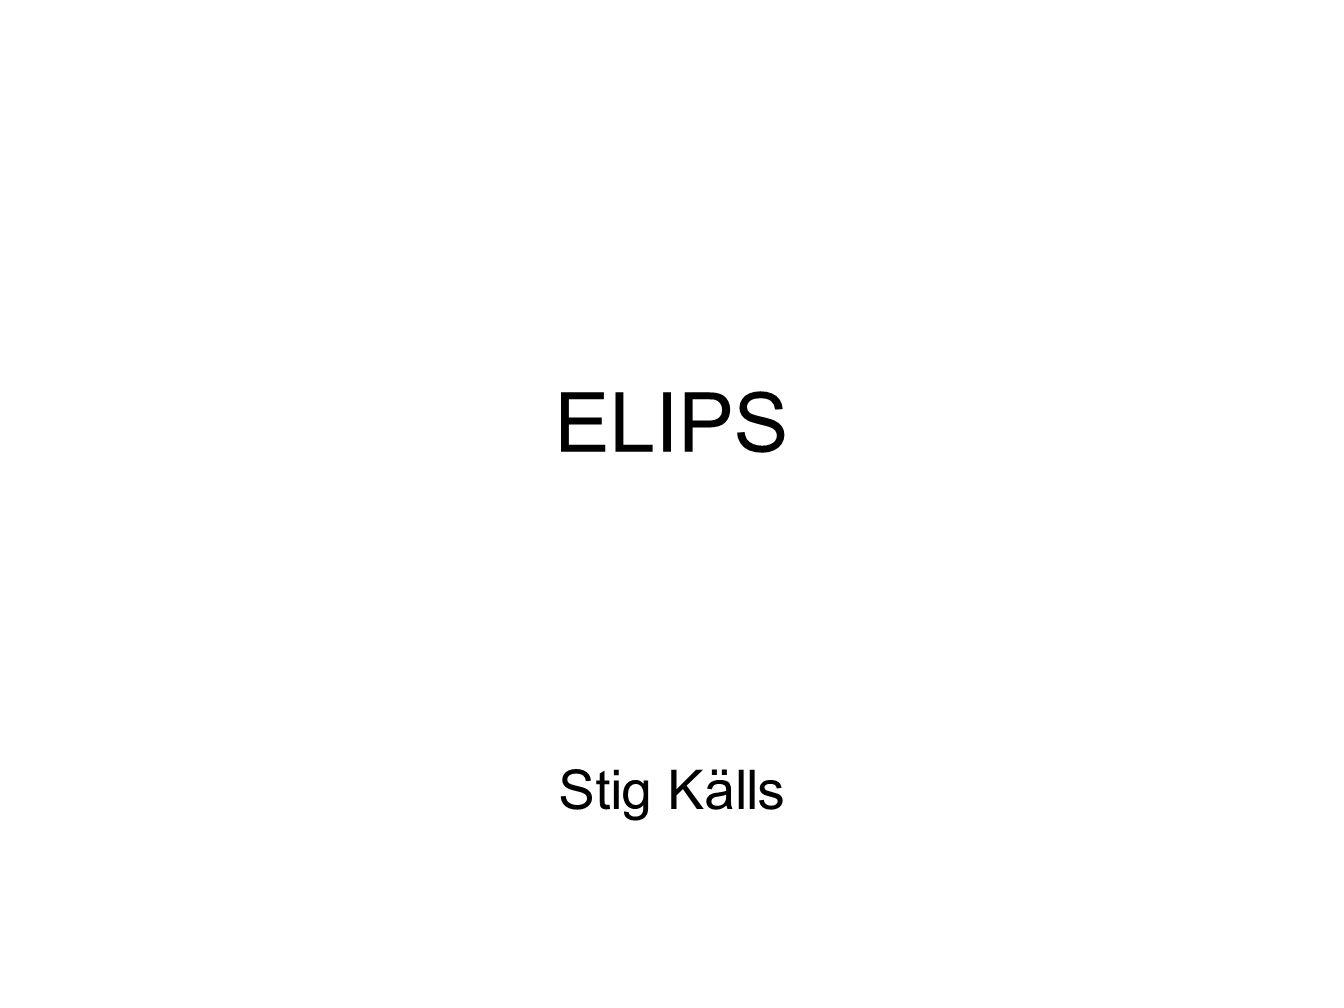 ELIPS Stig Källs